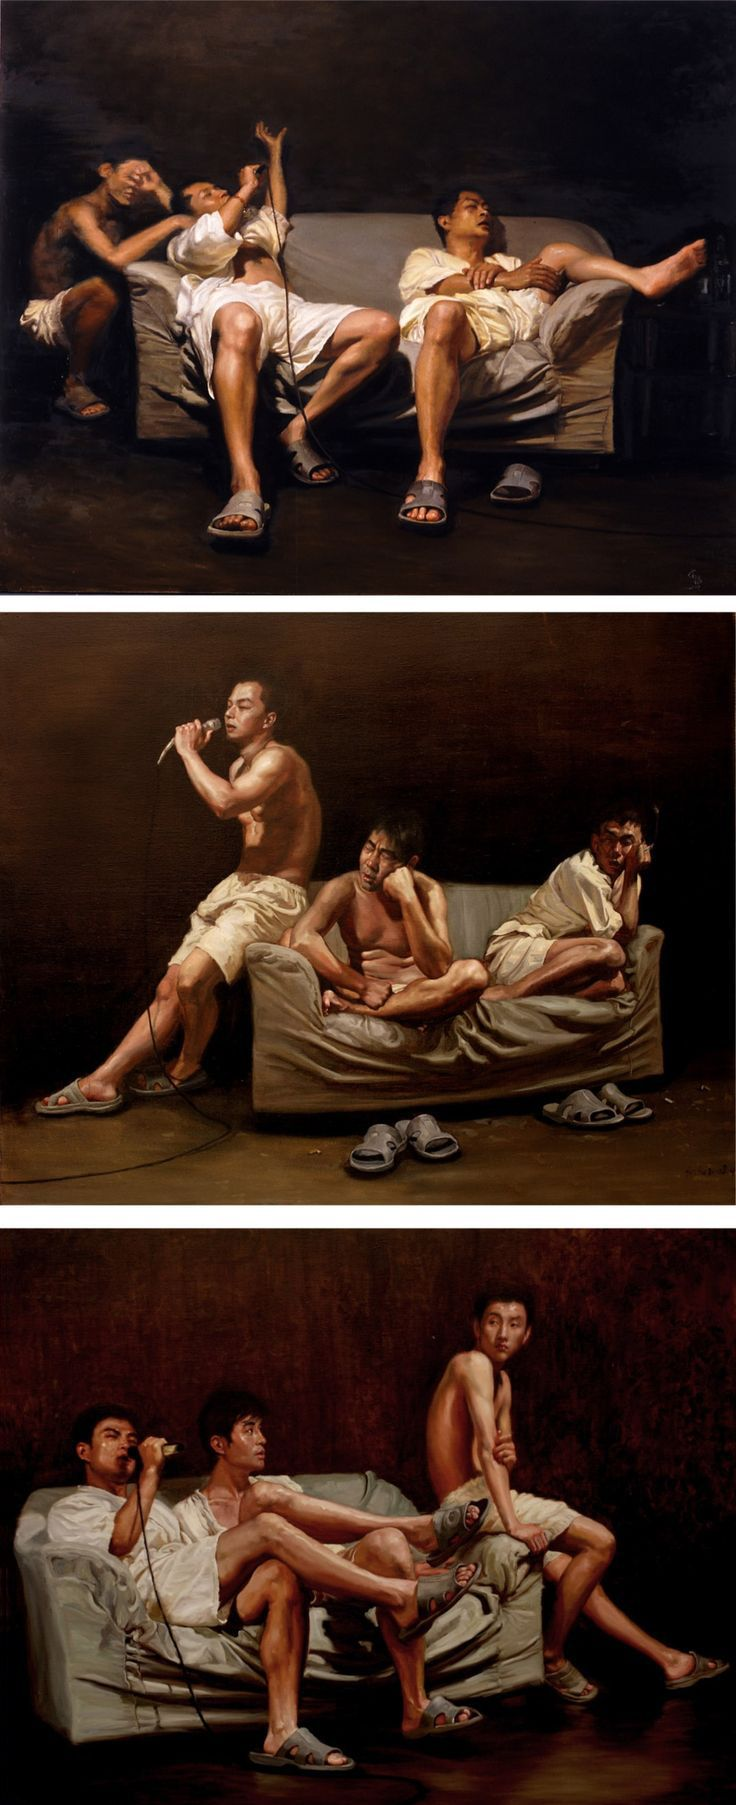 Realistic gay art